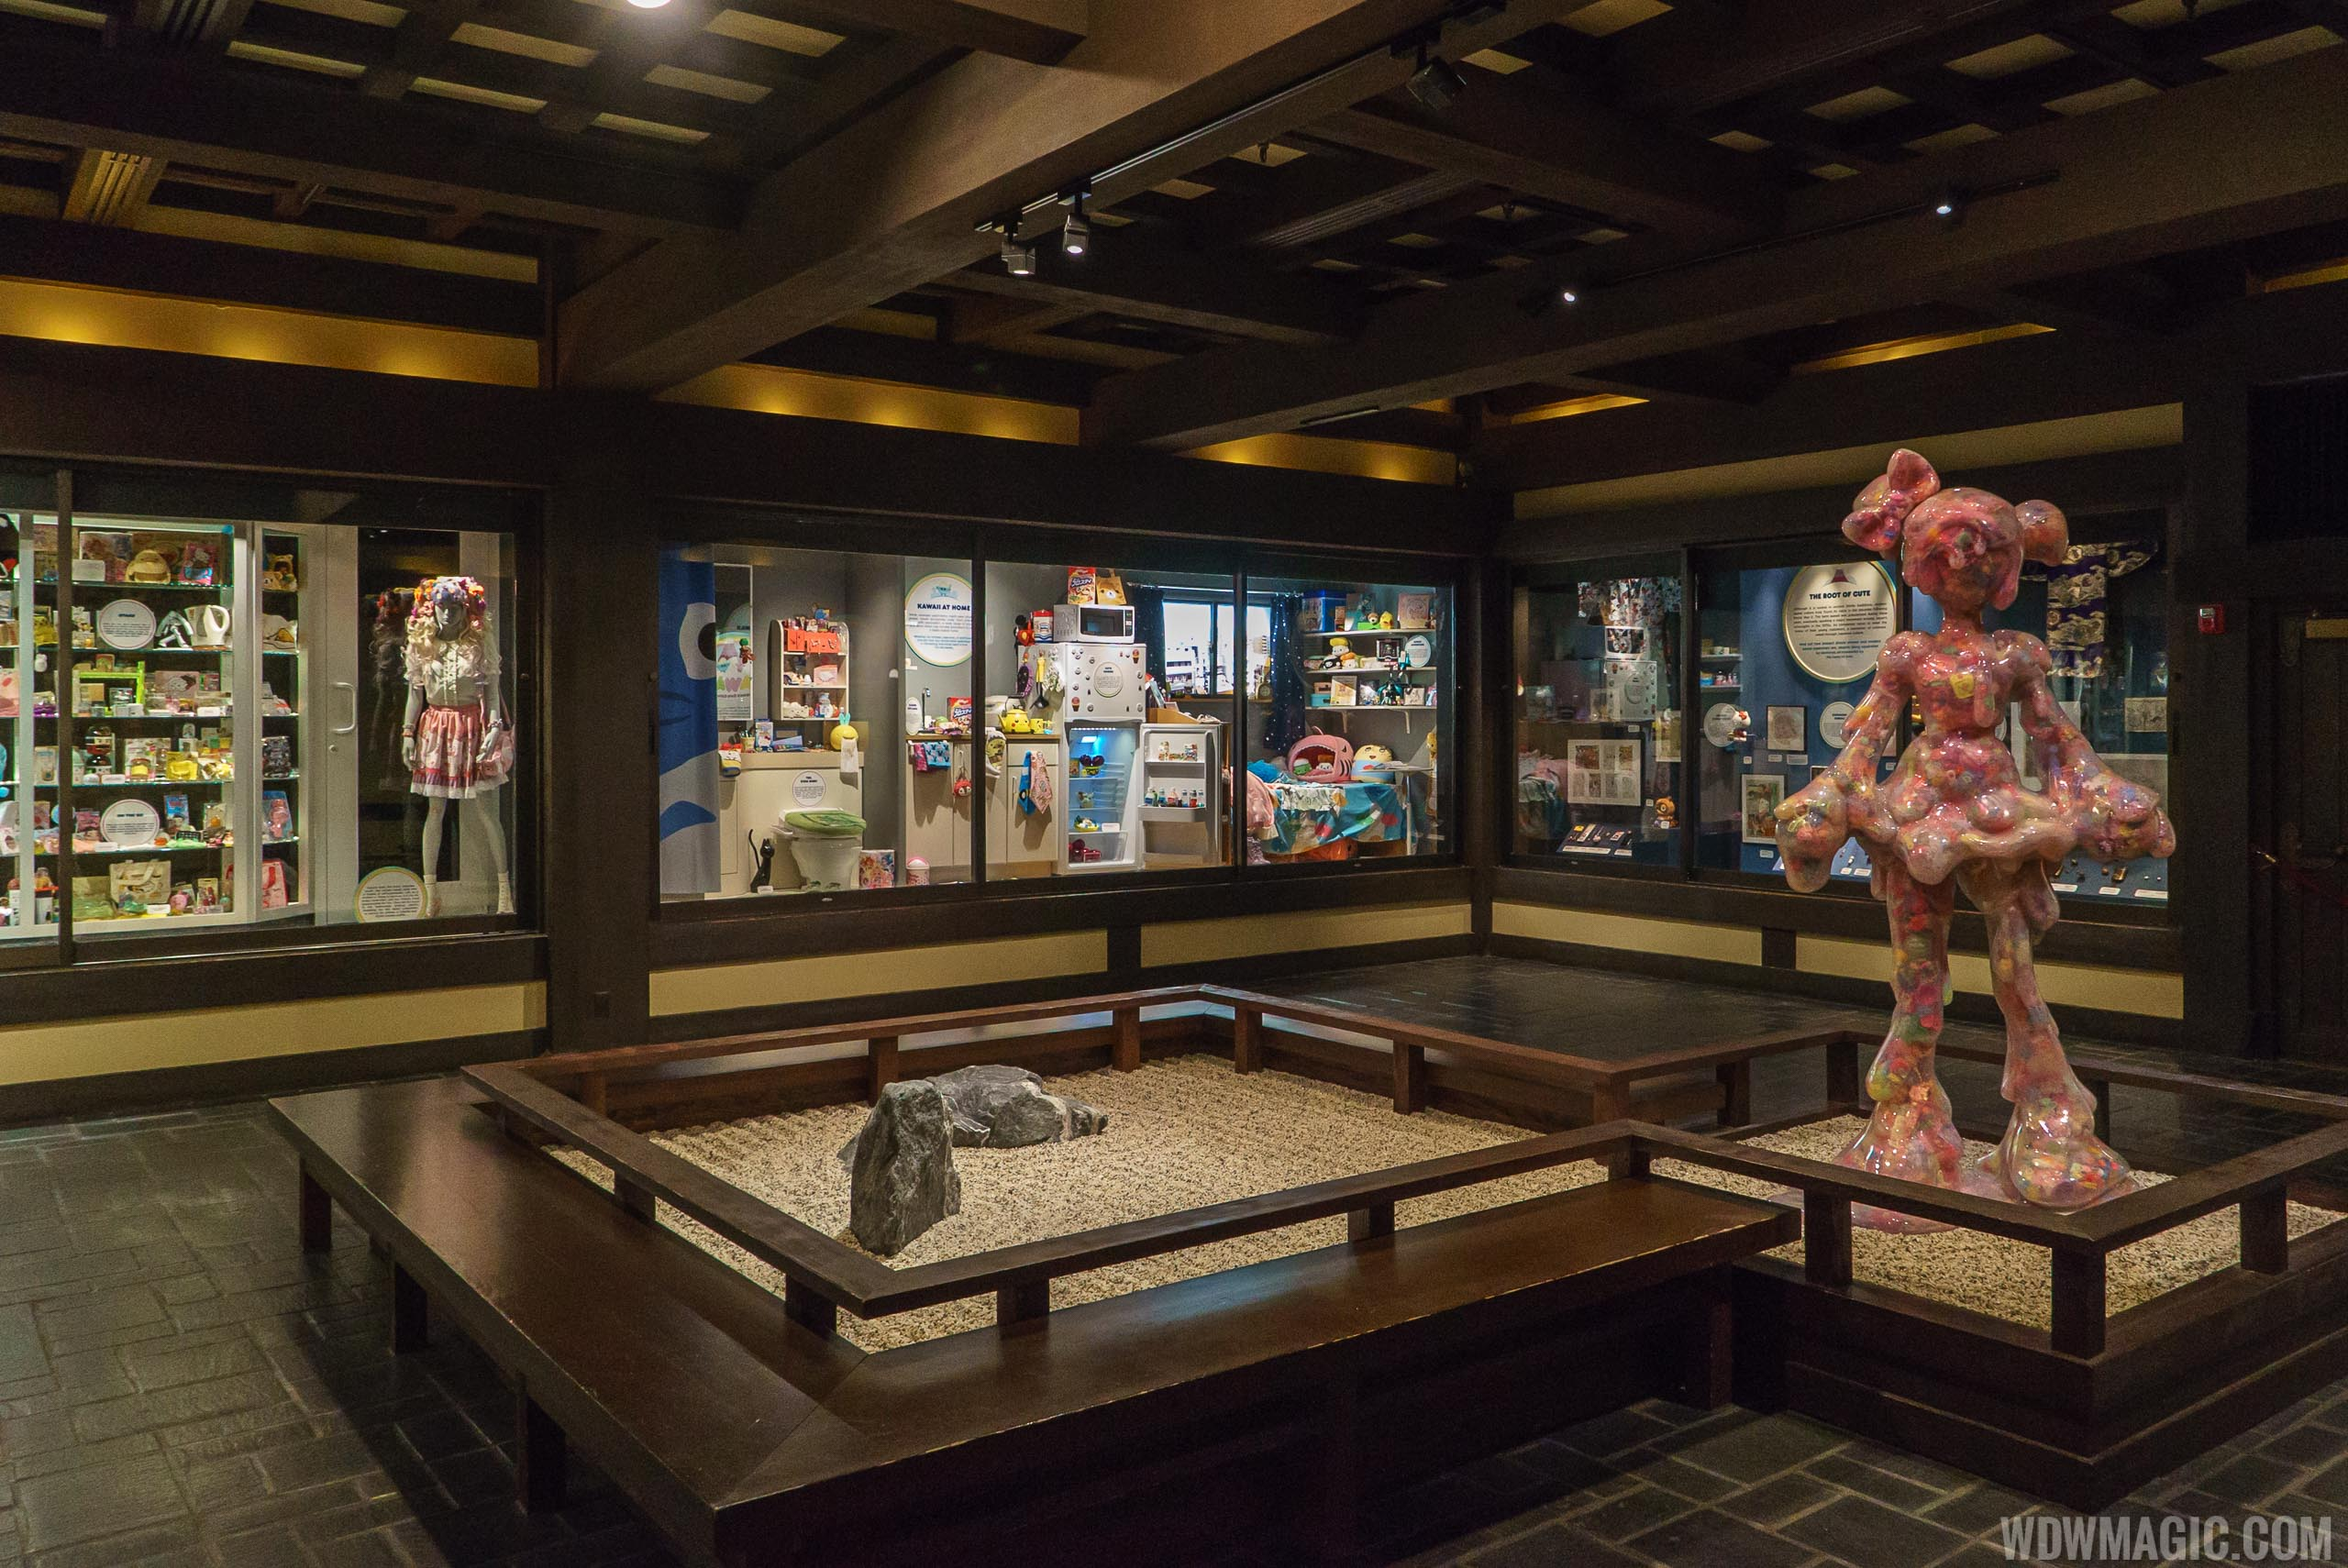 Kawaii - Japan's Cute Culture exhibit